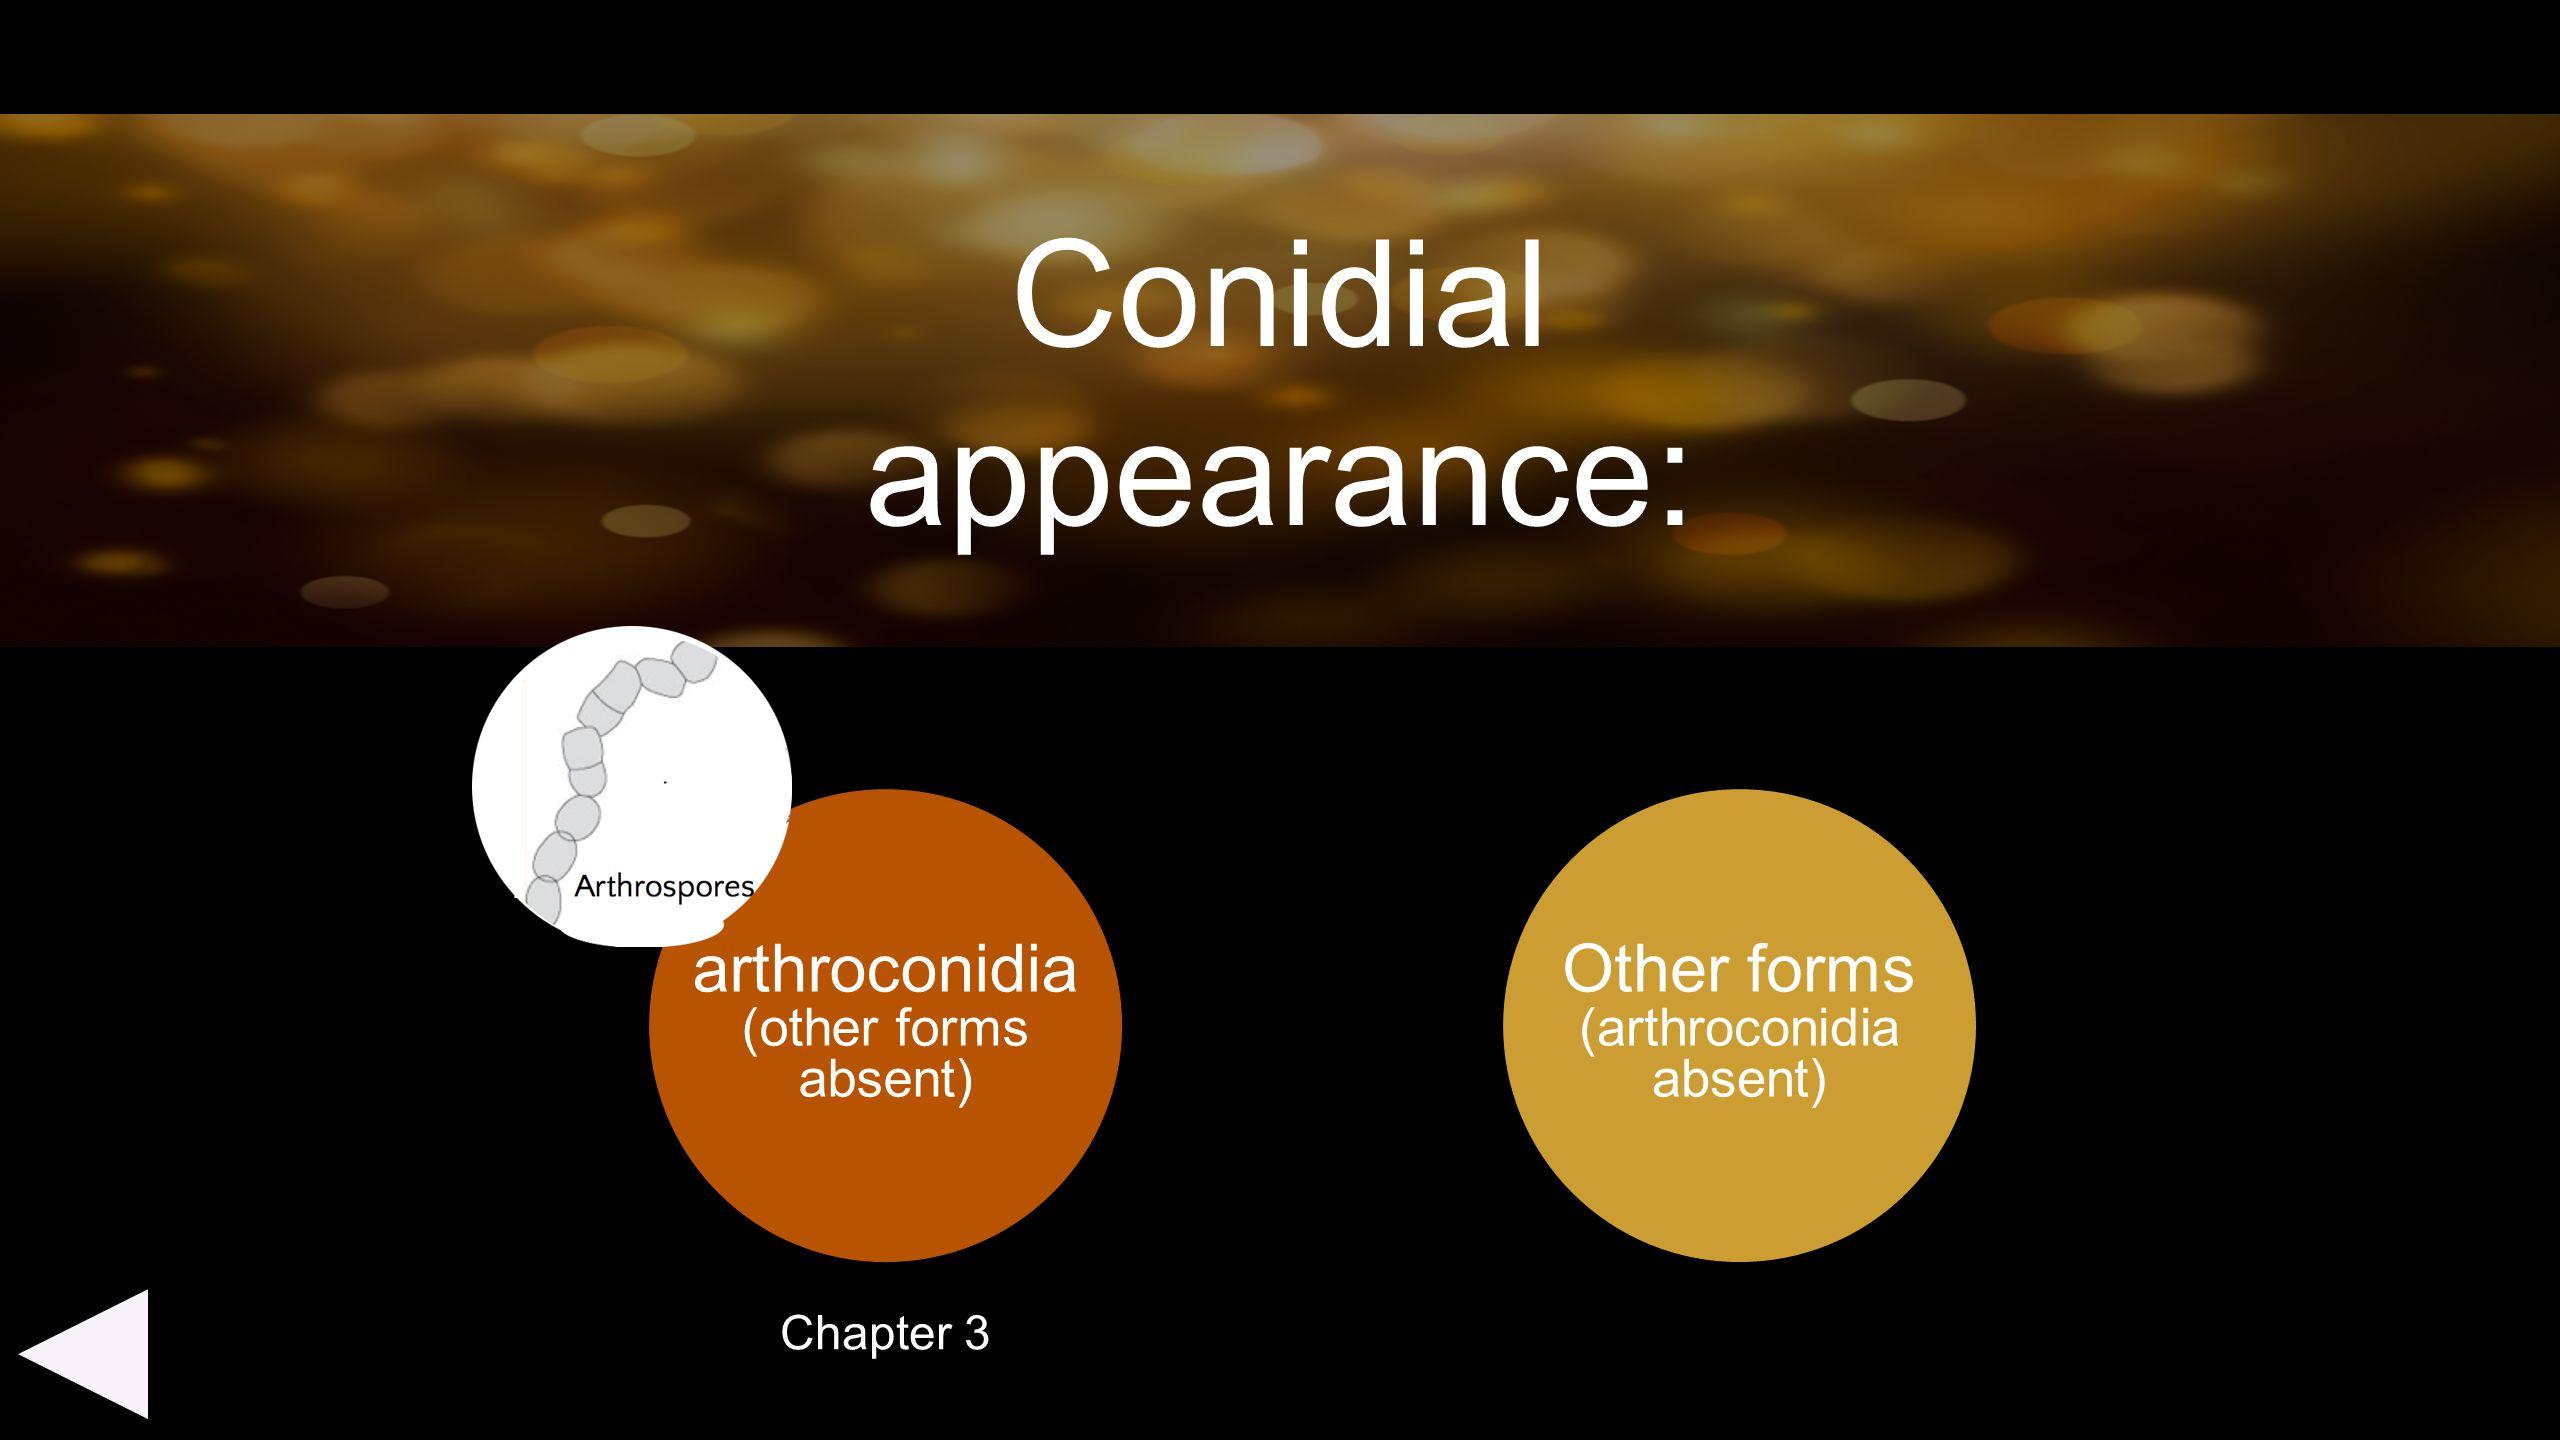 (arthroconidia absent)